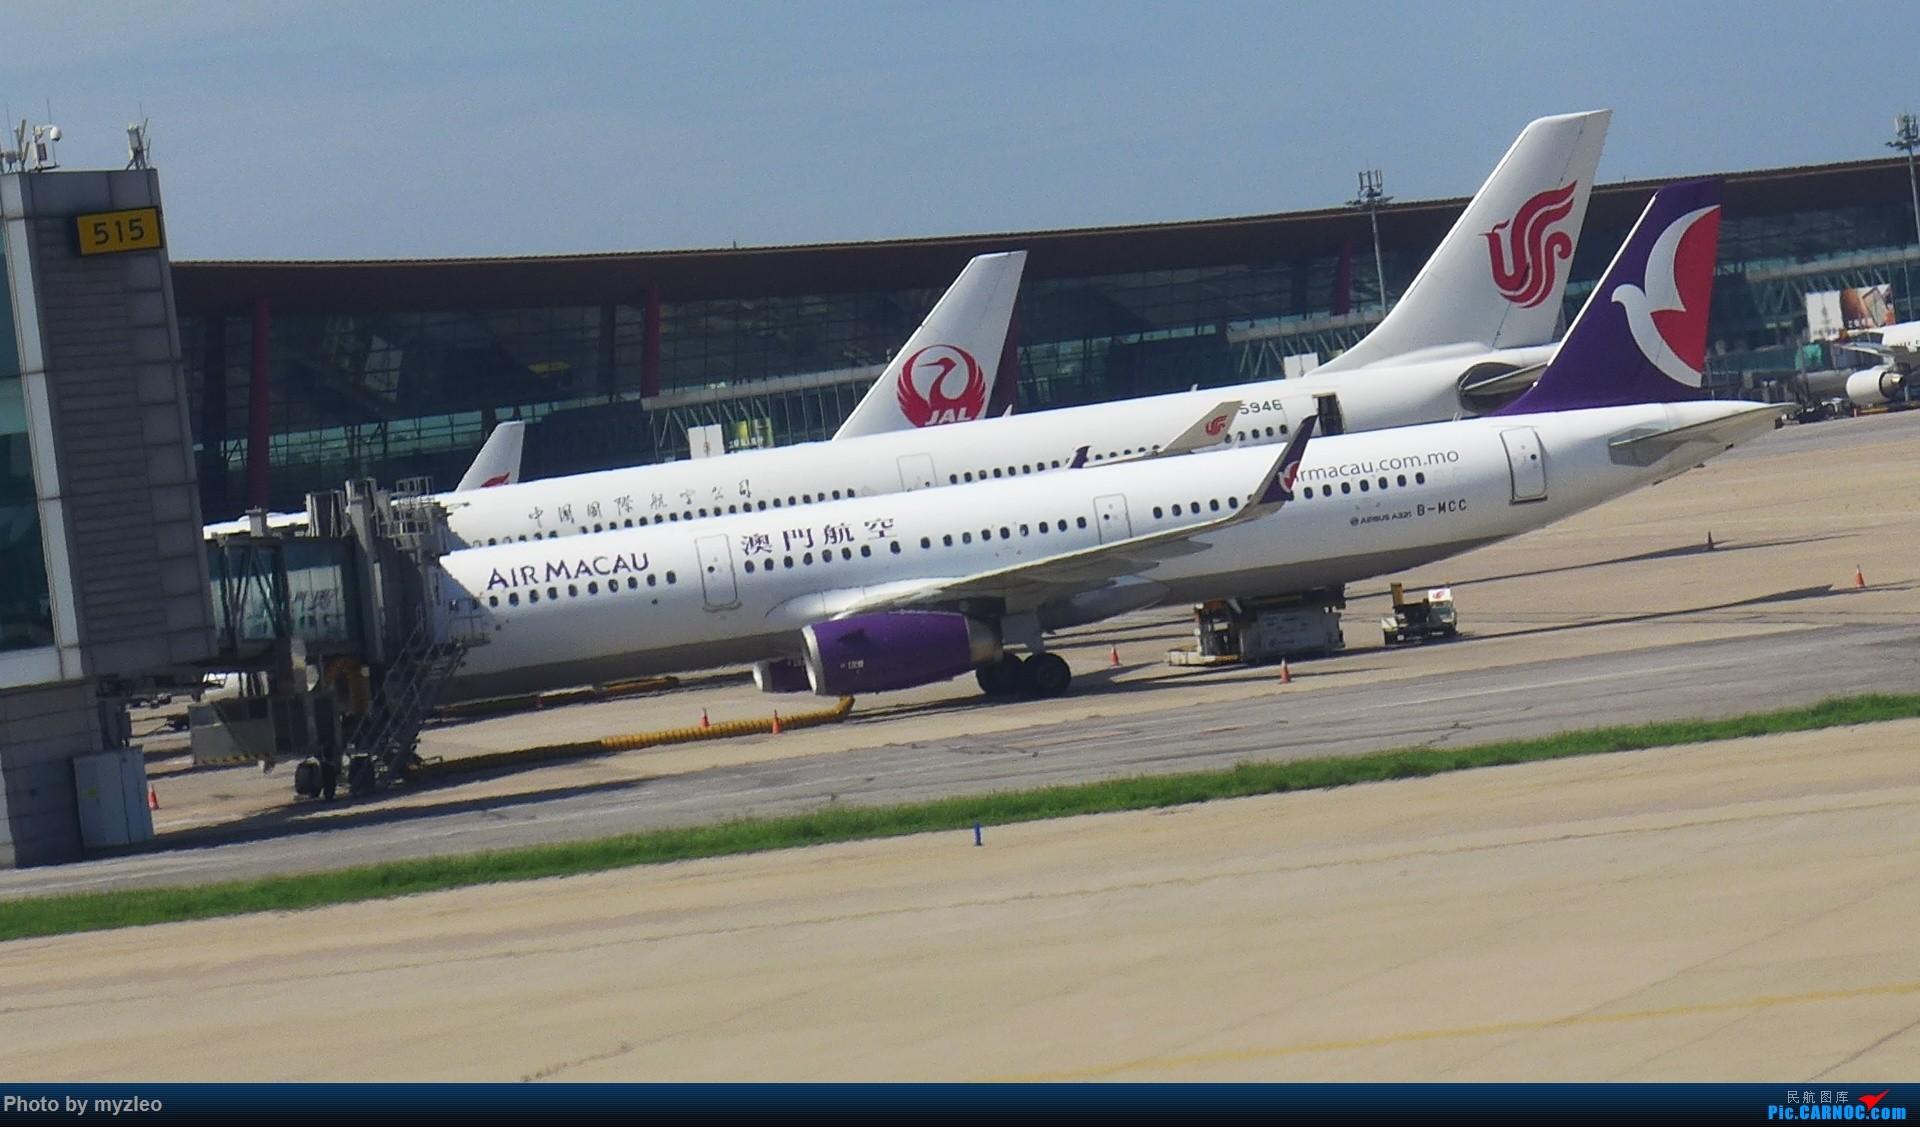 Re:[原创]【myzleo的游记3.1】三访帝都——记一次意外的惊喜,大鹅头初遇,第一次去中关村 AIRBUS A321-200 B-MCC 中国北京首都国际机场